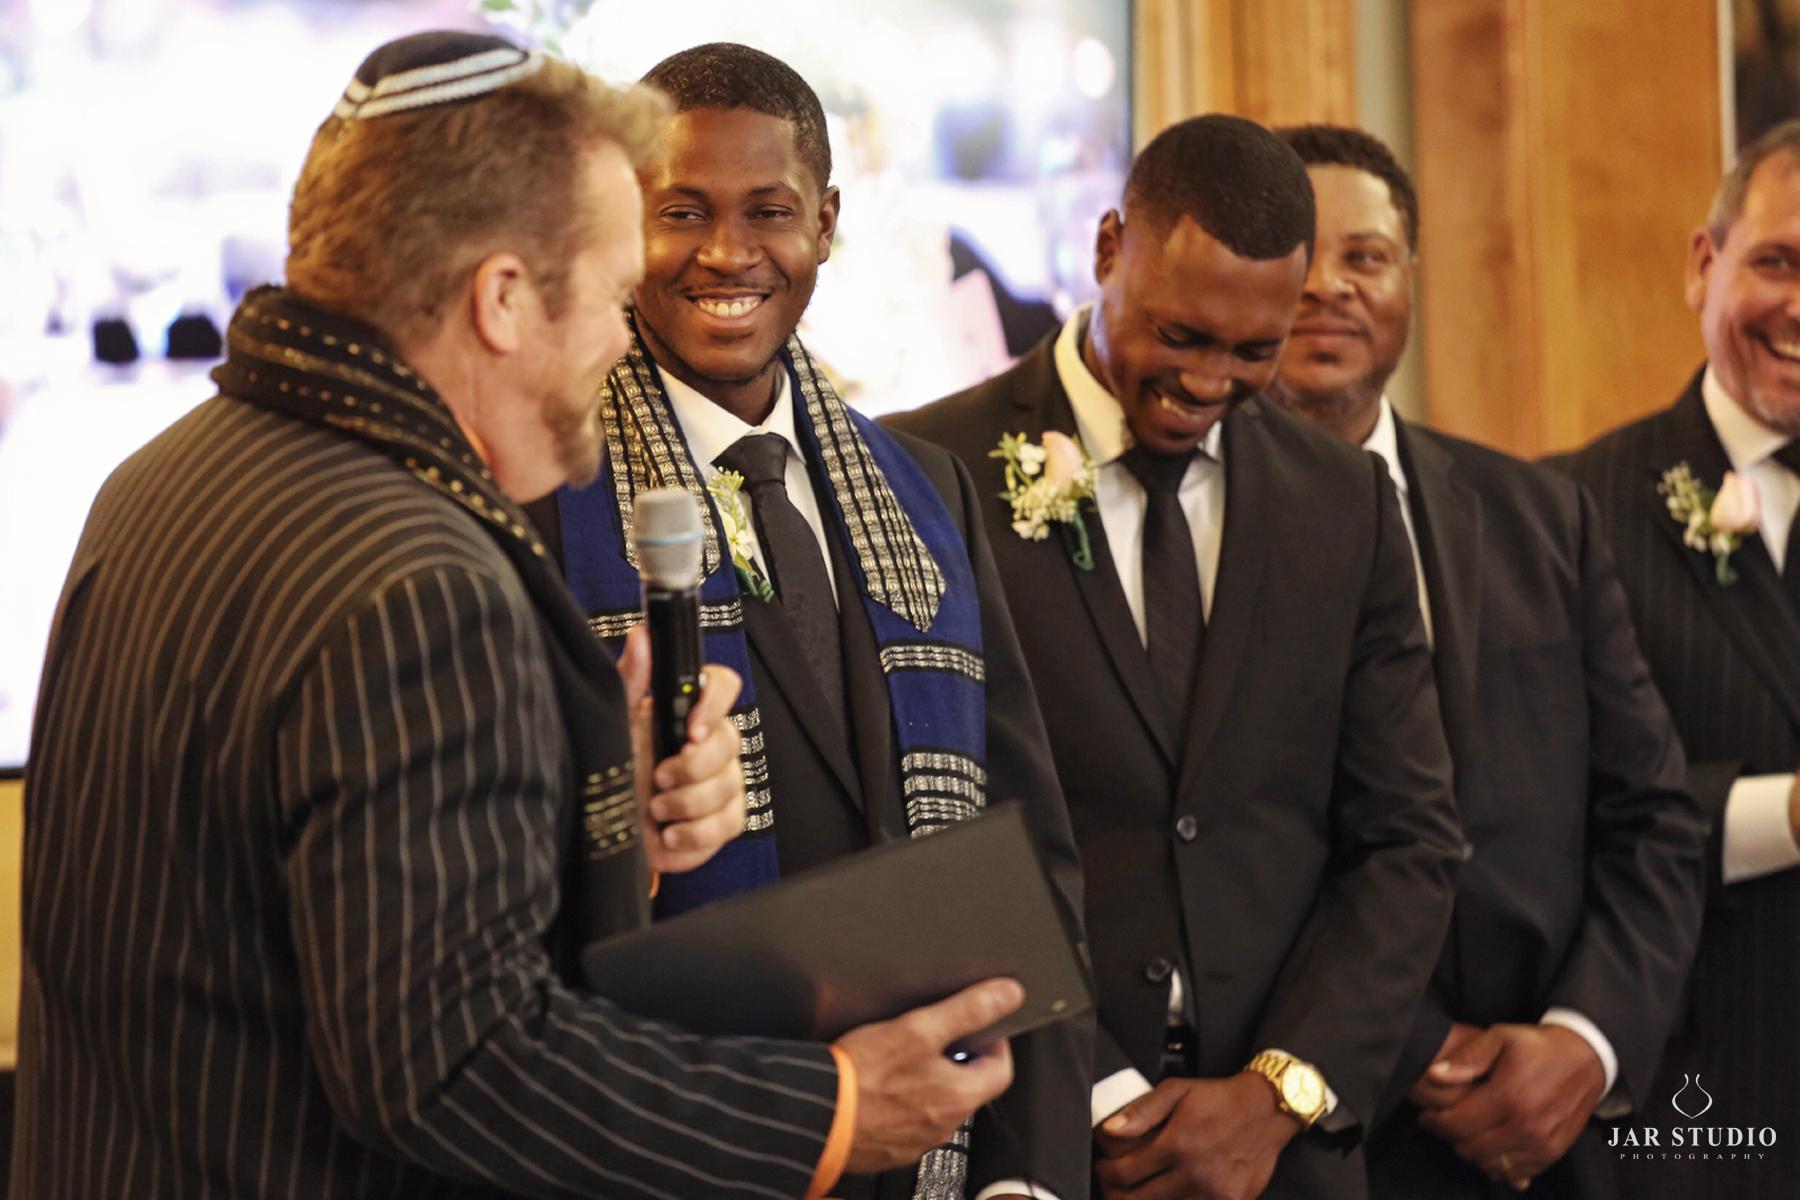 10-rabbi-groom-fun-moment-wedding-photography-jarstudio.jpg